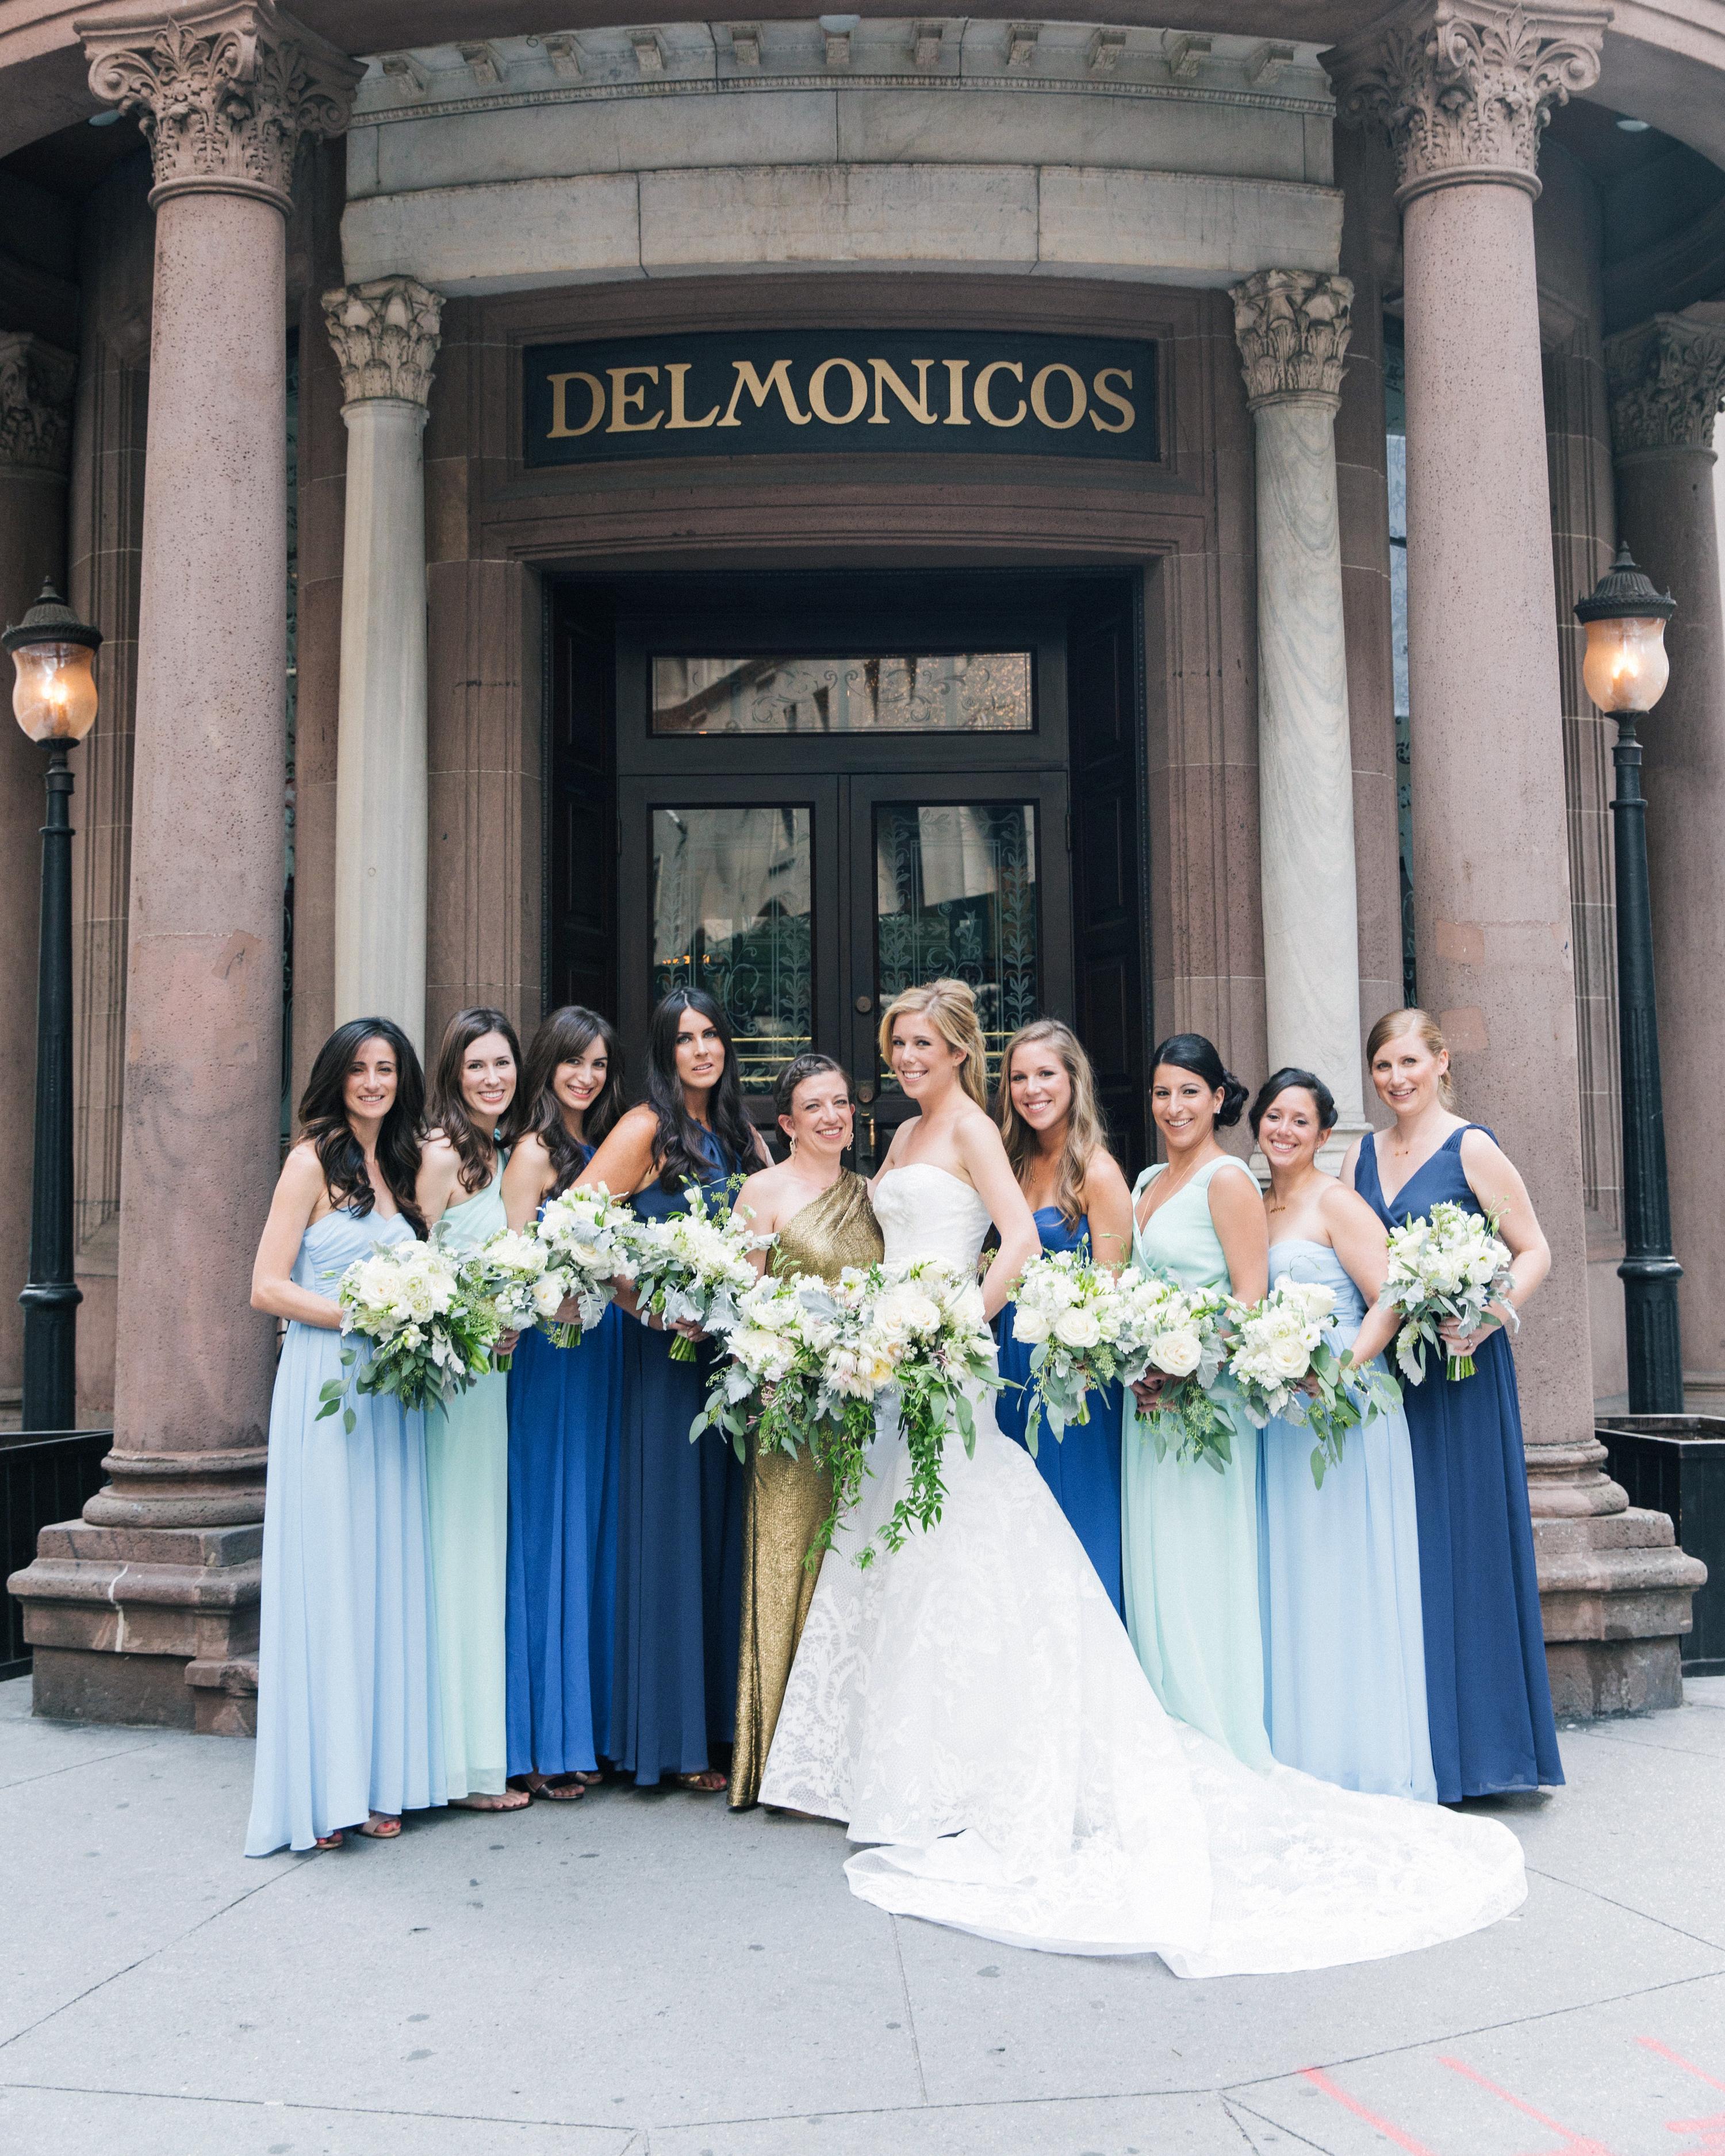 amy-bob-wedding-bridesmaids-0305-s111884-0715.jpg